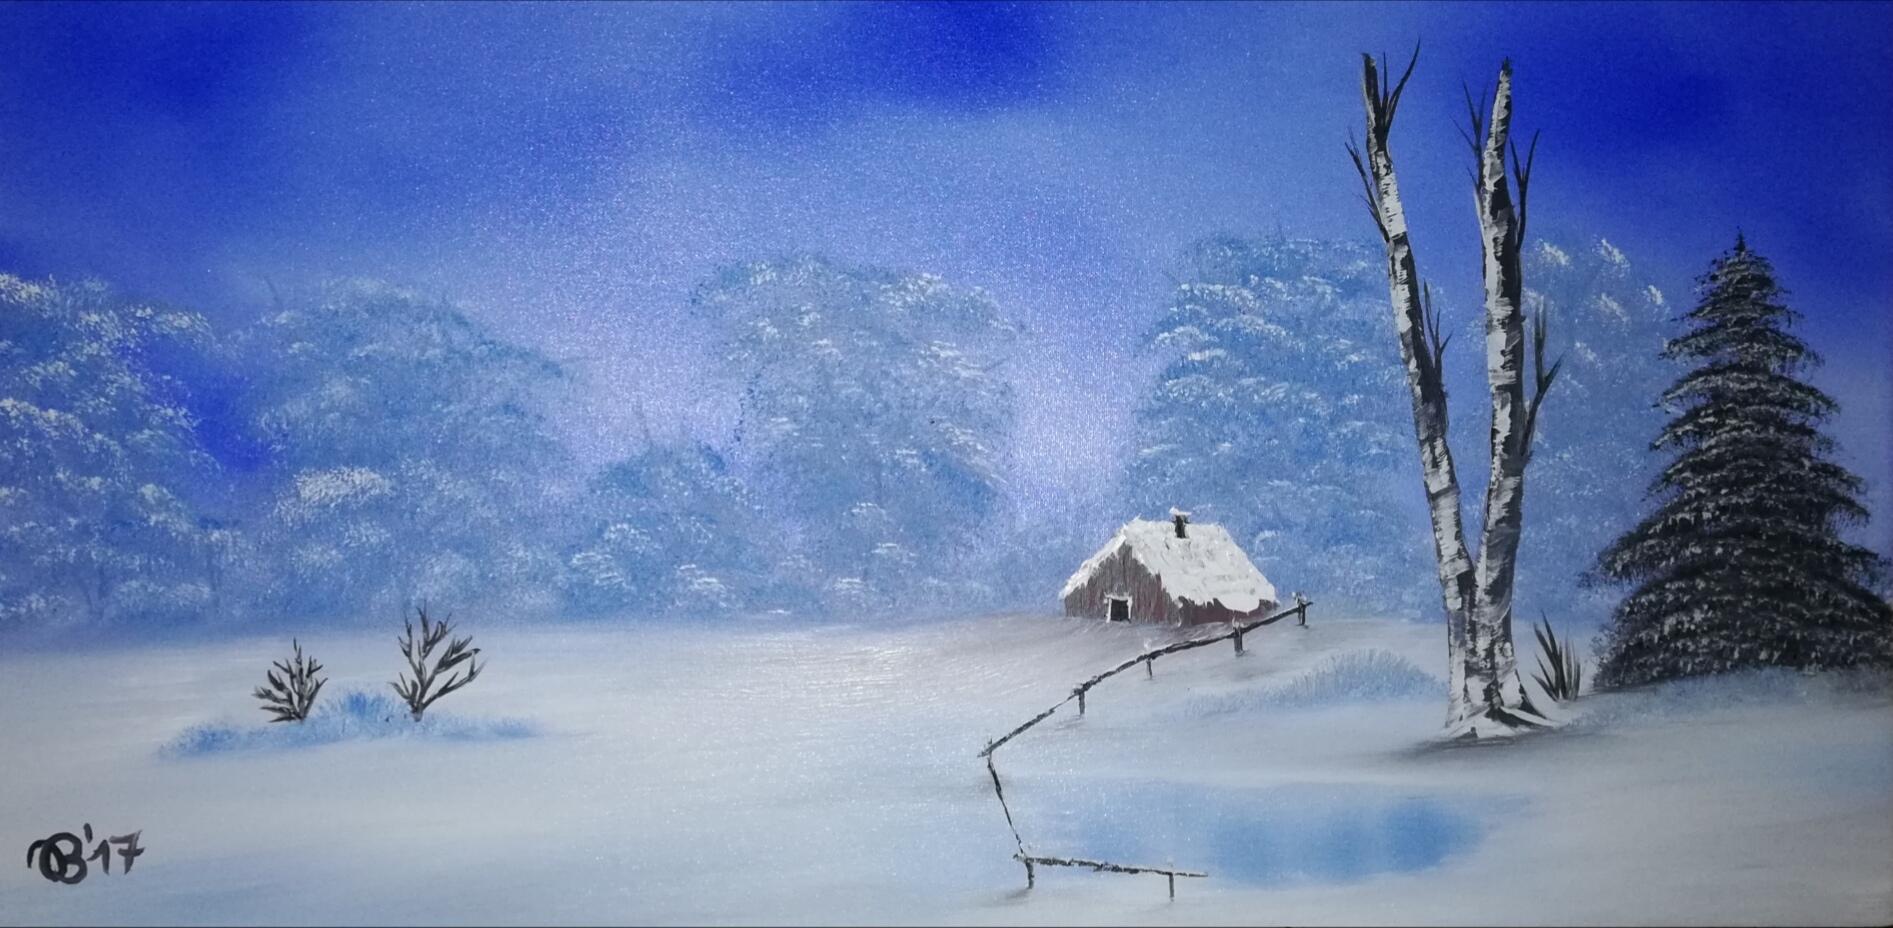 (77)     Winter am See     80 cm x 40 cm